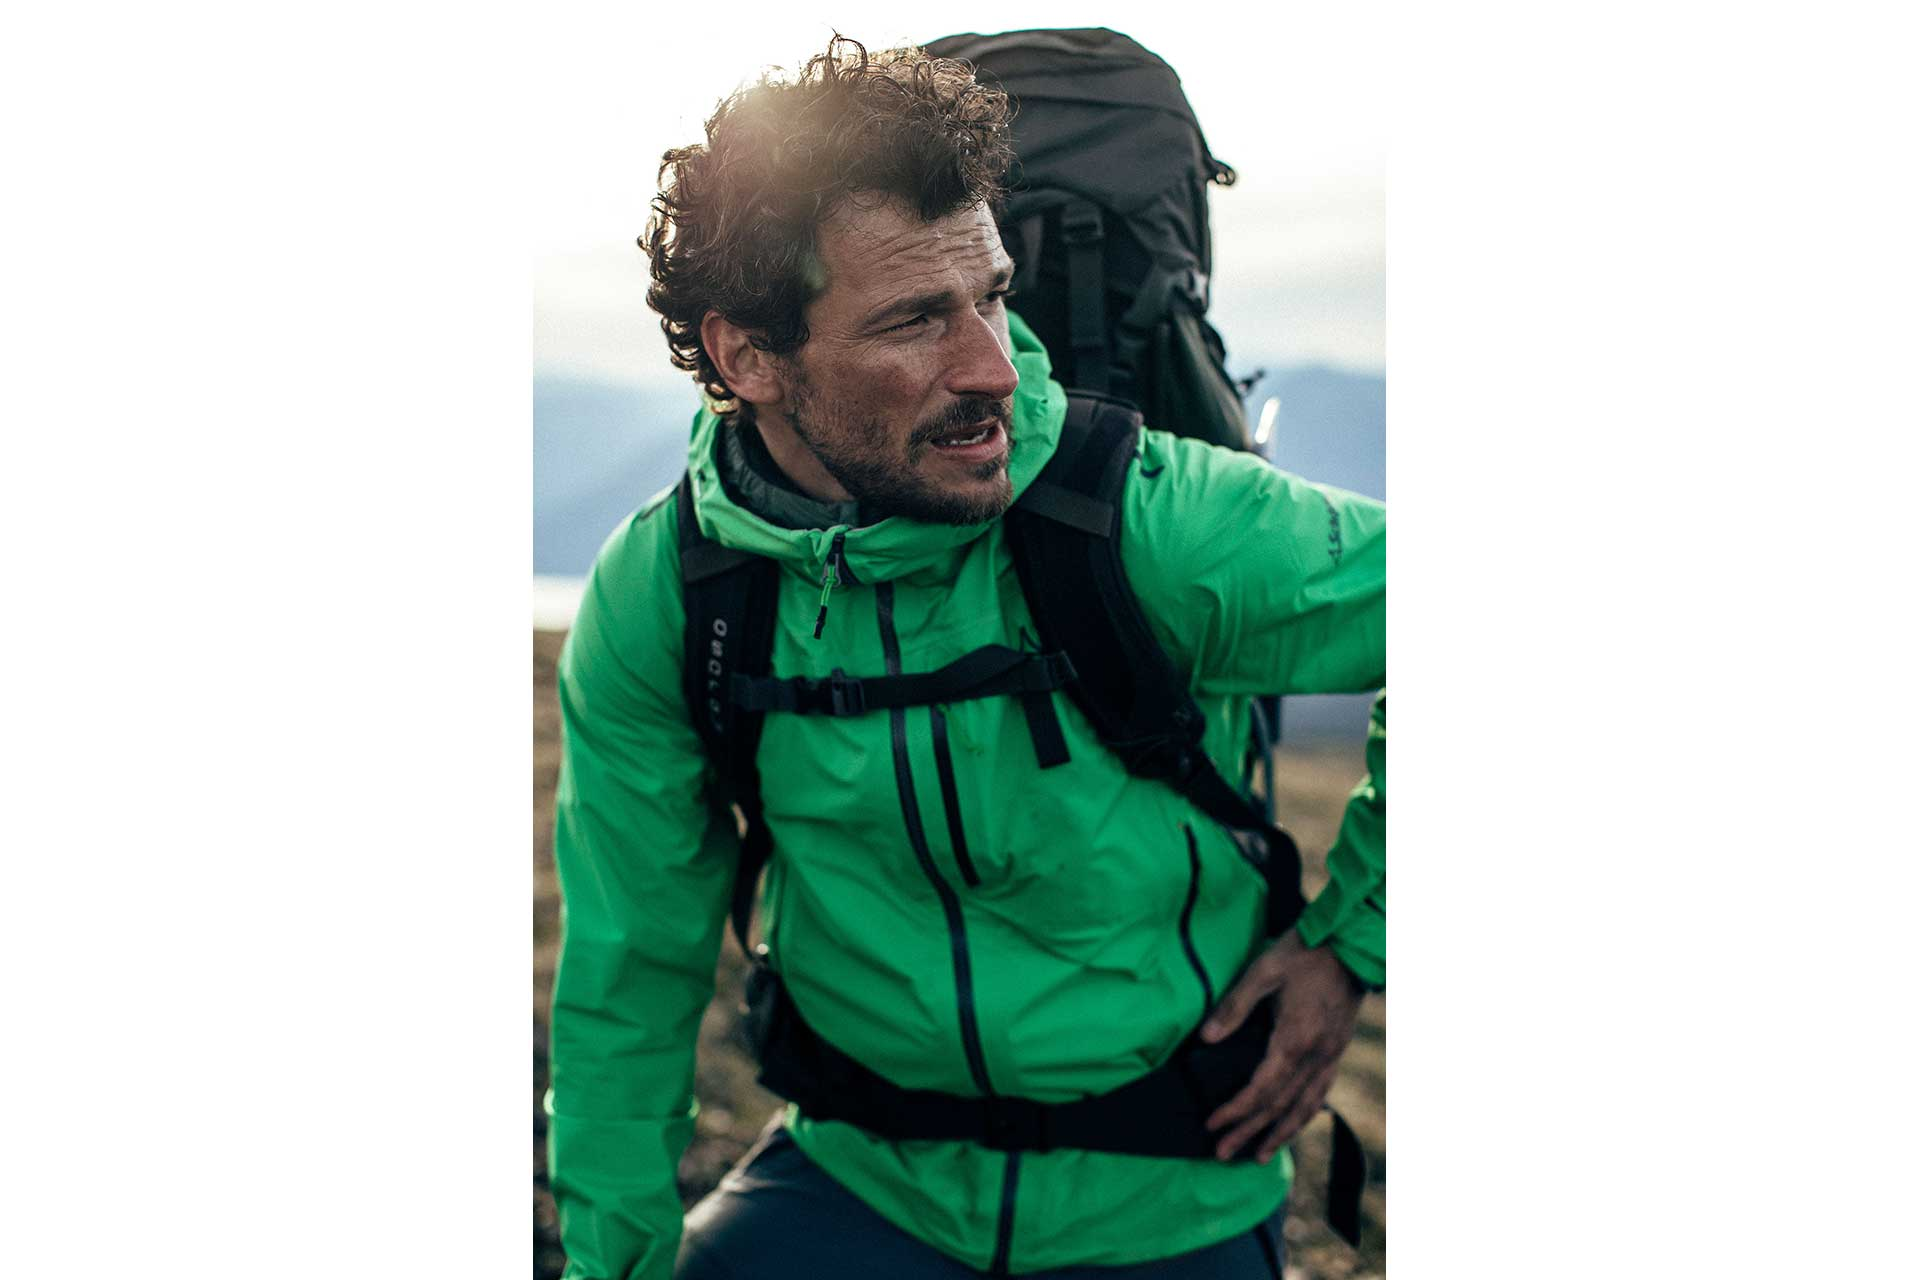 Model Fotograf Outdoor Wandern Bergsteigen Kanada sport Michael Müller Yukon Schöffel Kampagne